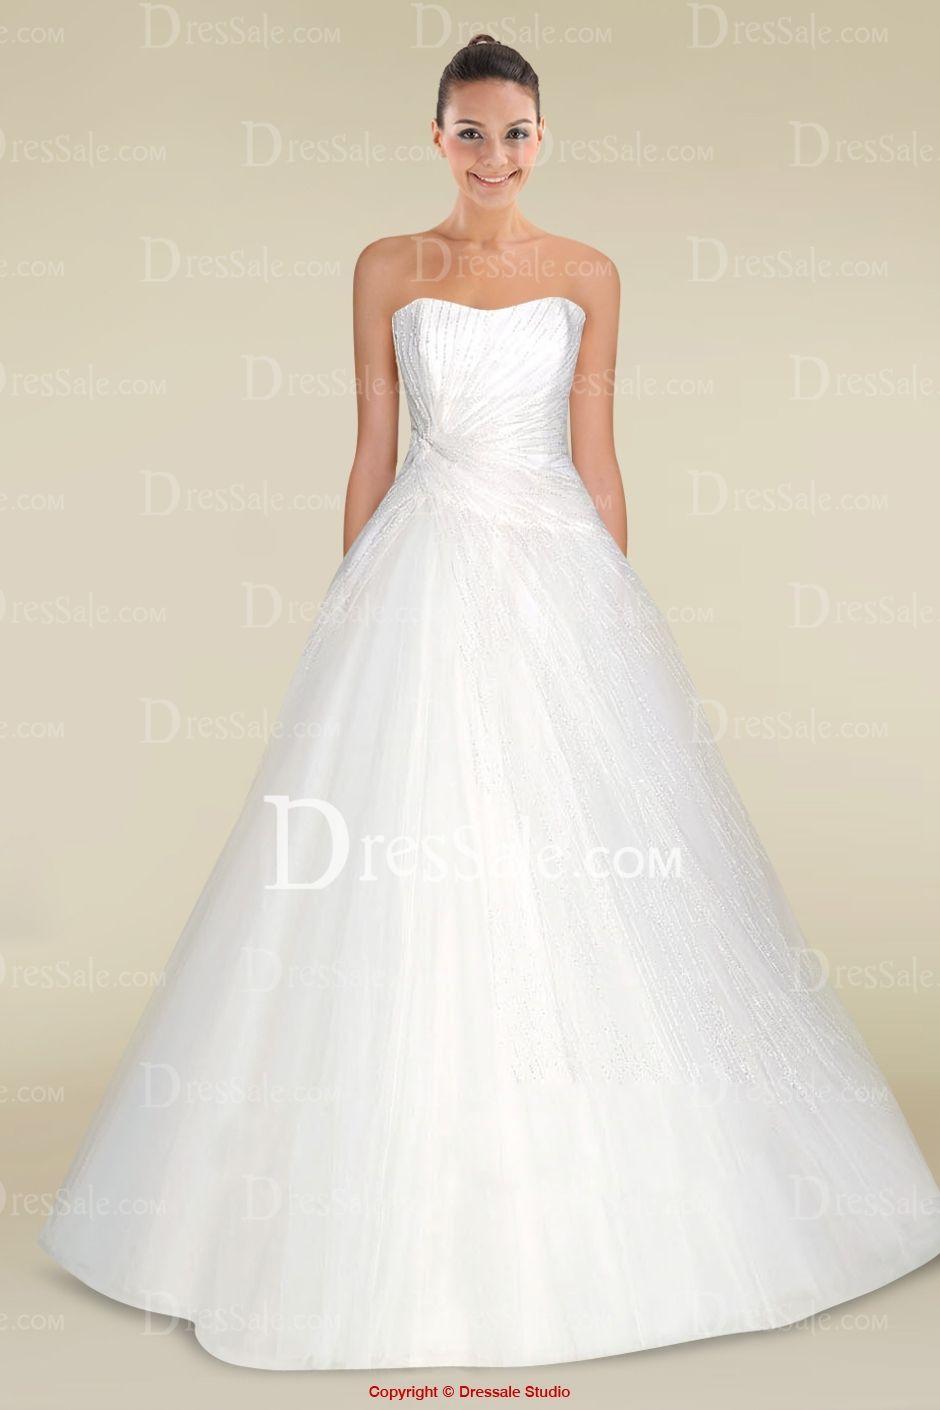 Decent Ball Gown Wedding Dress with Tremendous Pleats | wedding ...